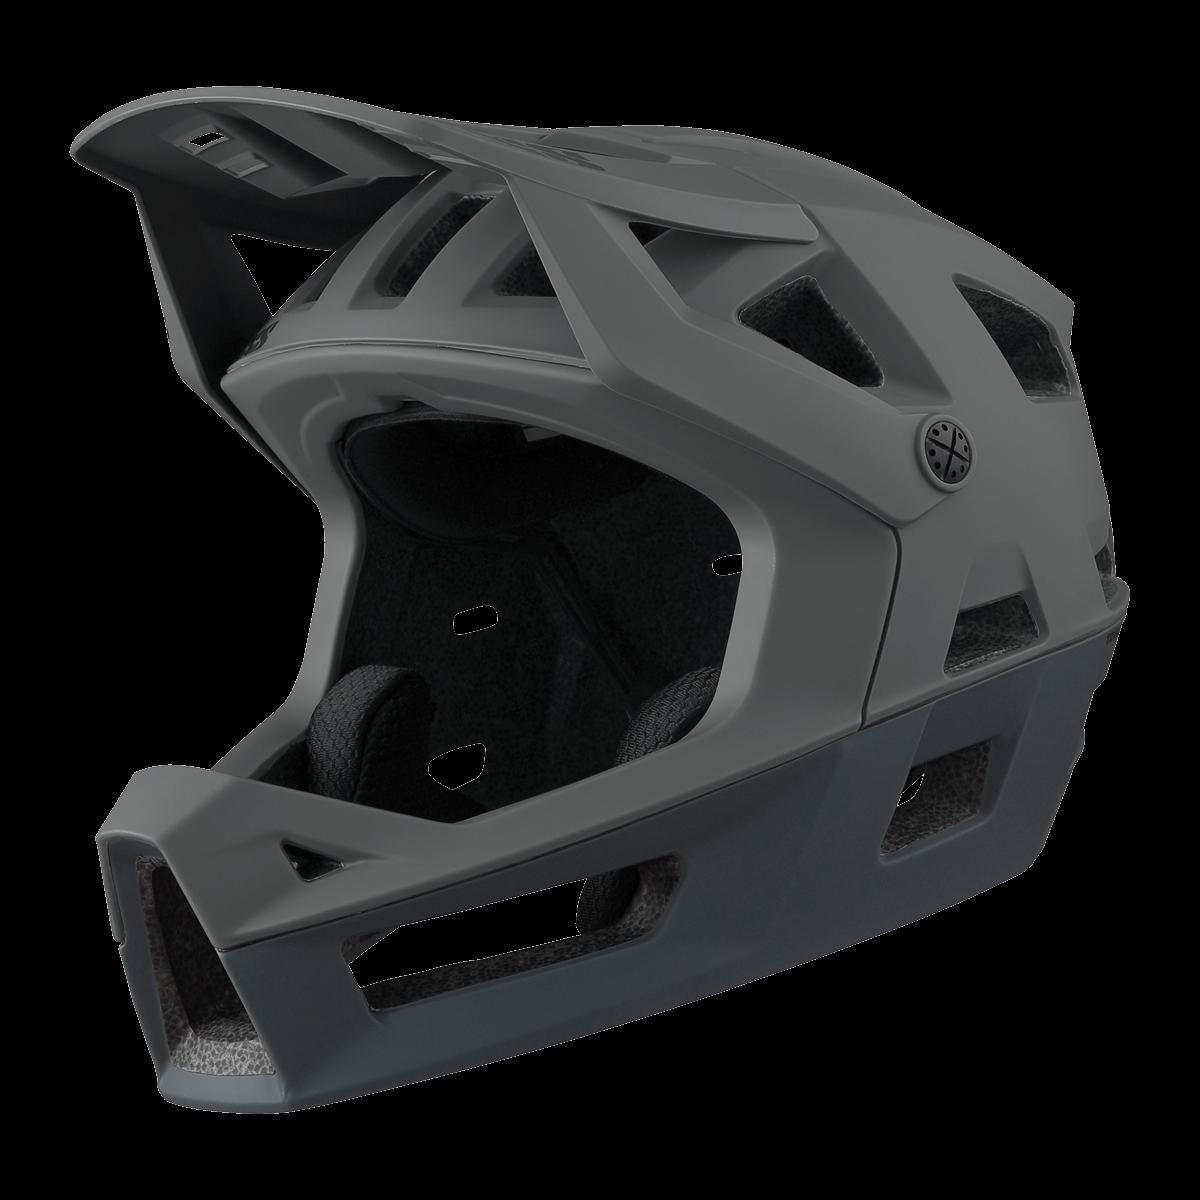 iXS integrální helma Trigger FF Graphite vel. ML (58-62cm)